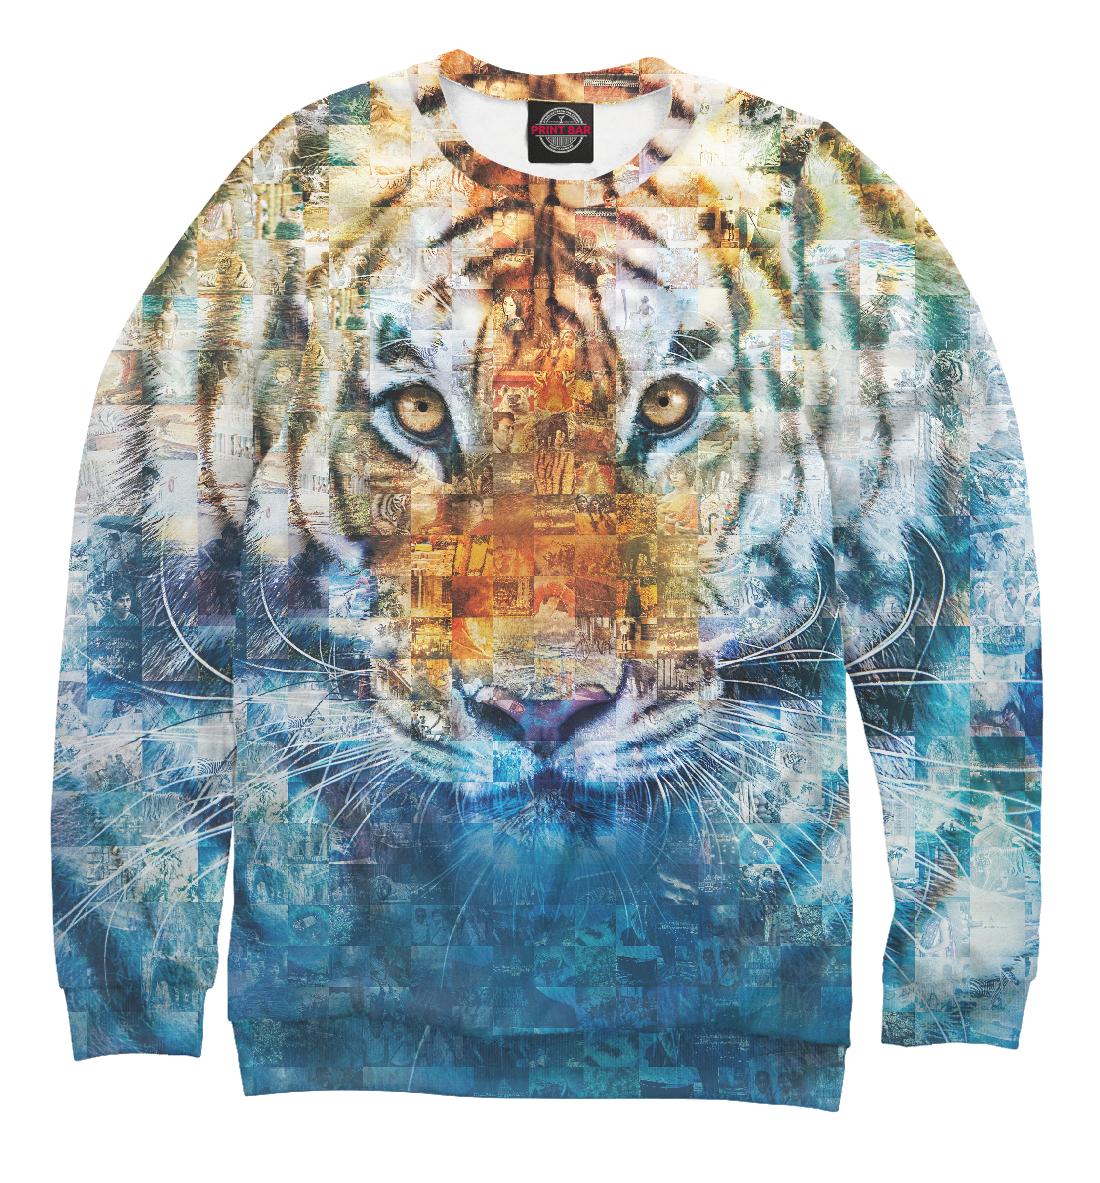 Купить Тигр - Жизнь Пи, Printbar, Свитшоты, HIS-149200-swi-1